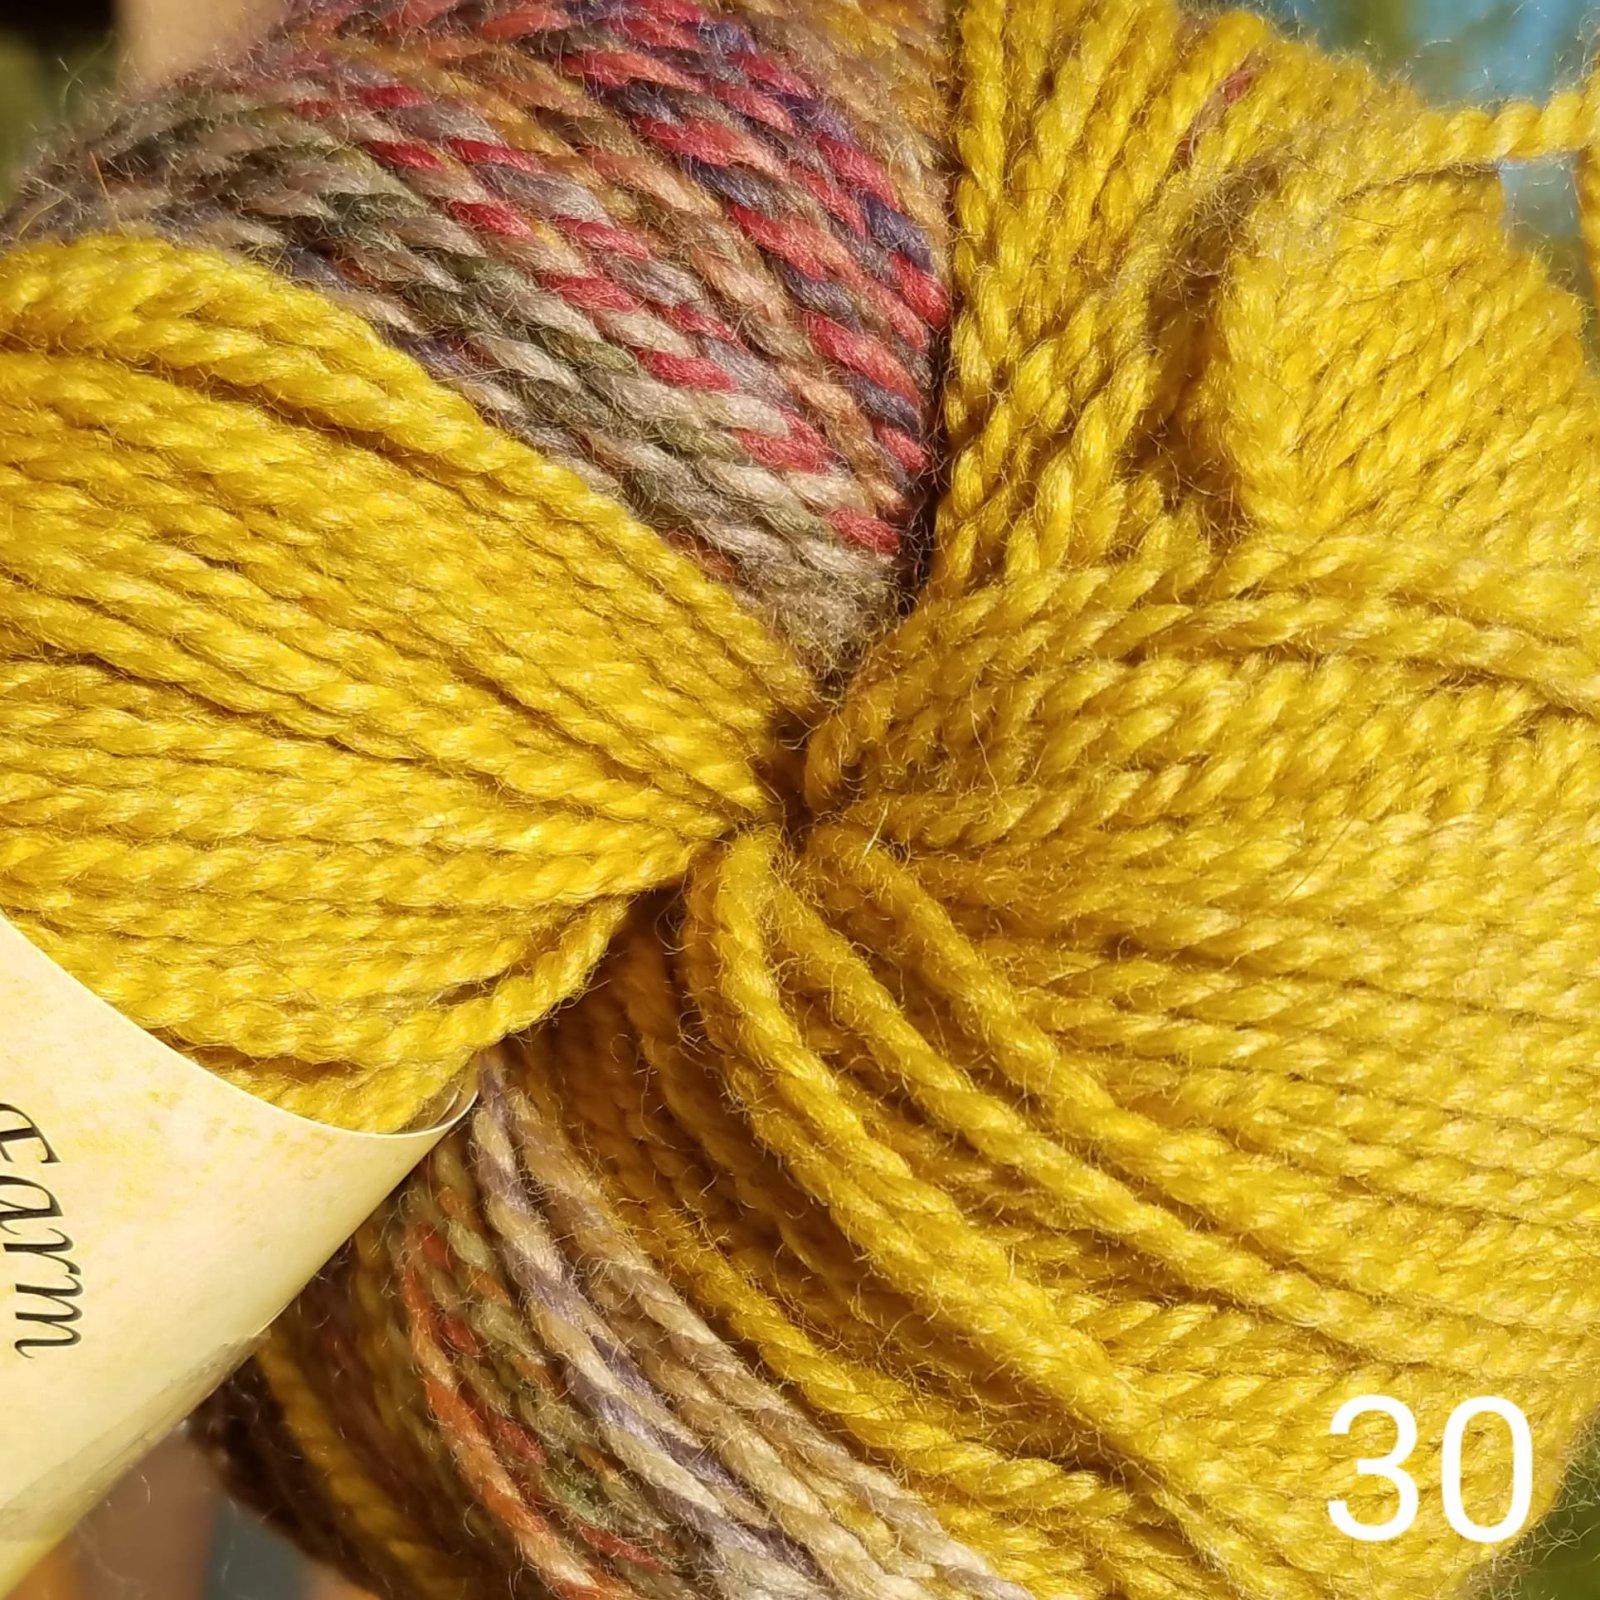 Yarn Bundle 30